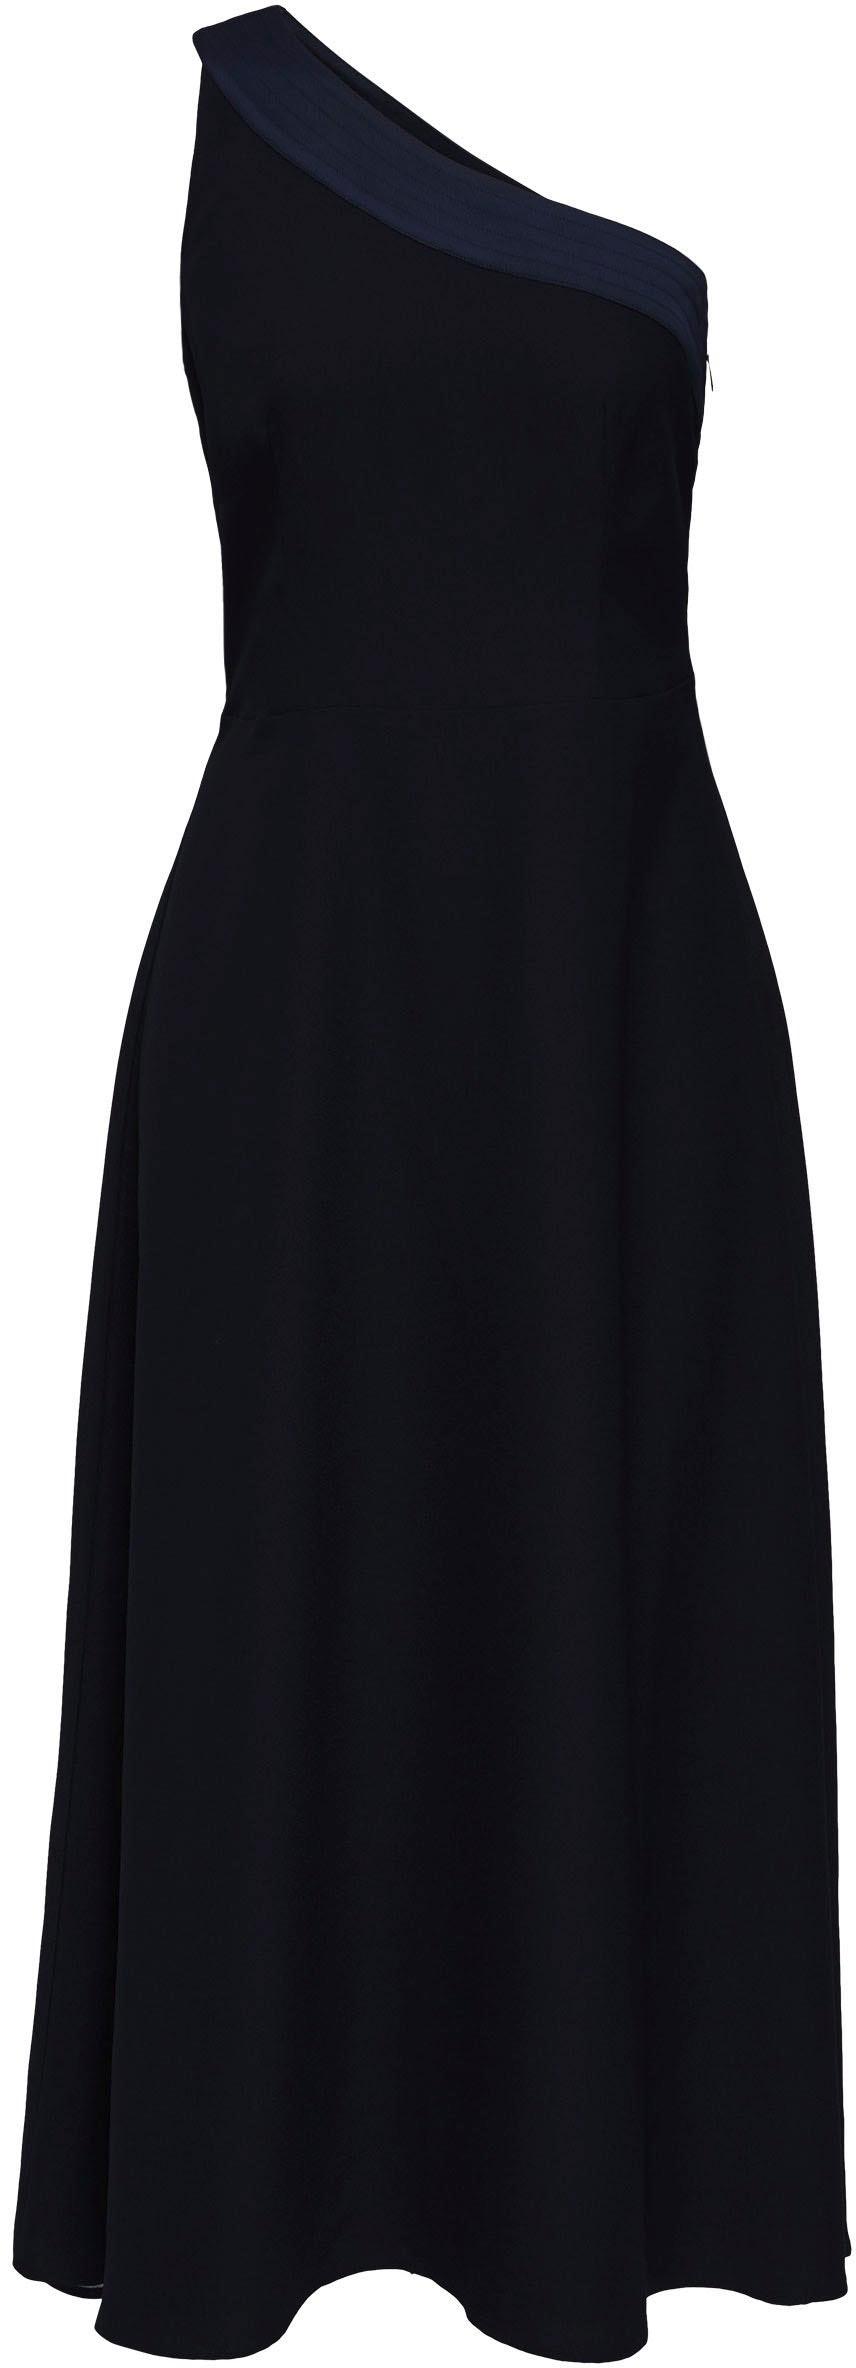 Image of Esprit Collection Abendkleid